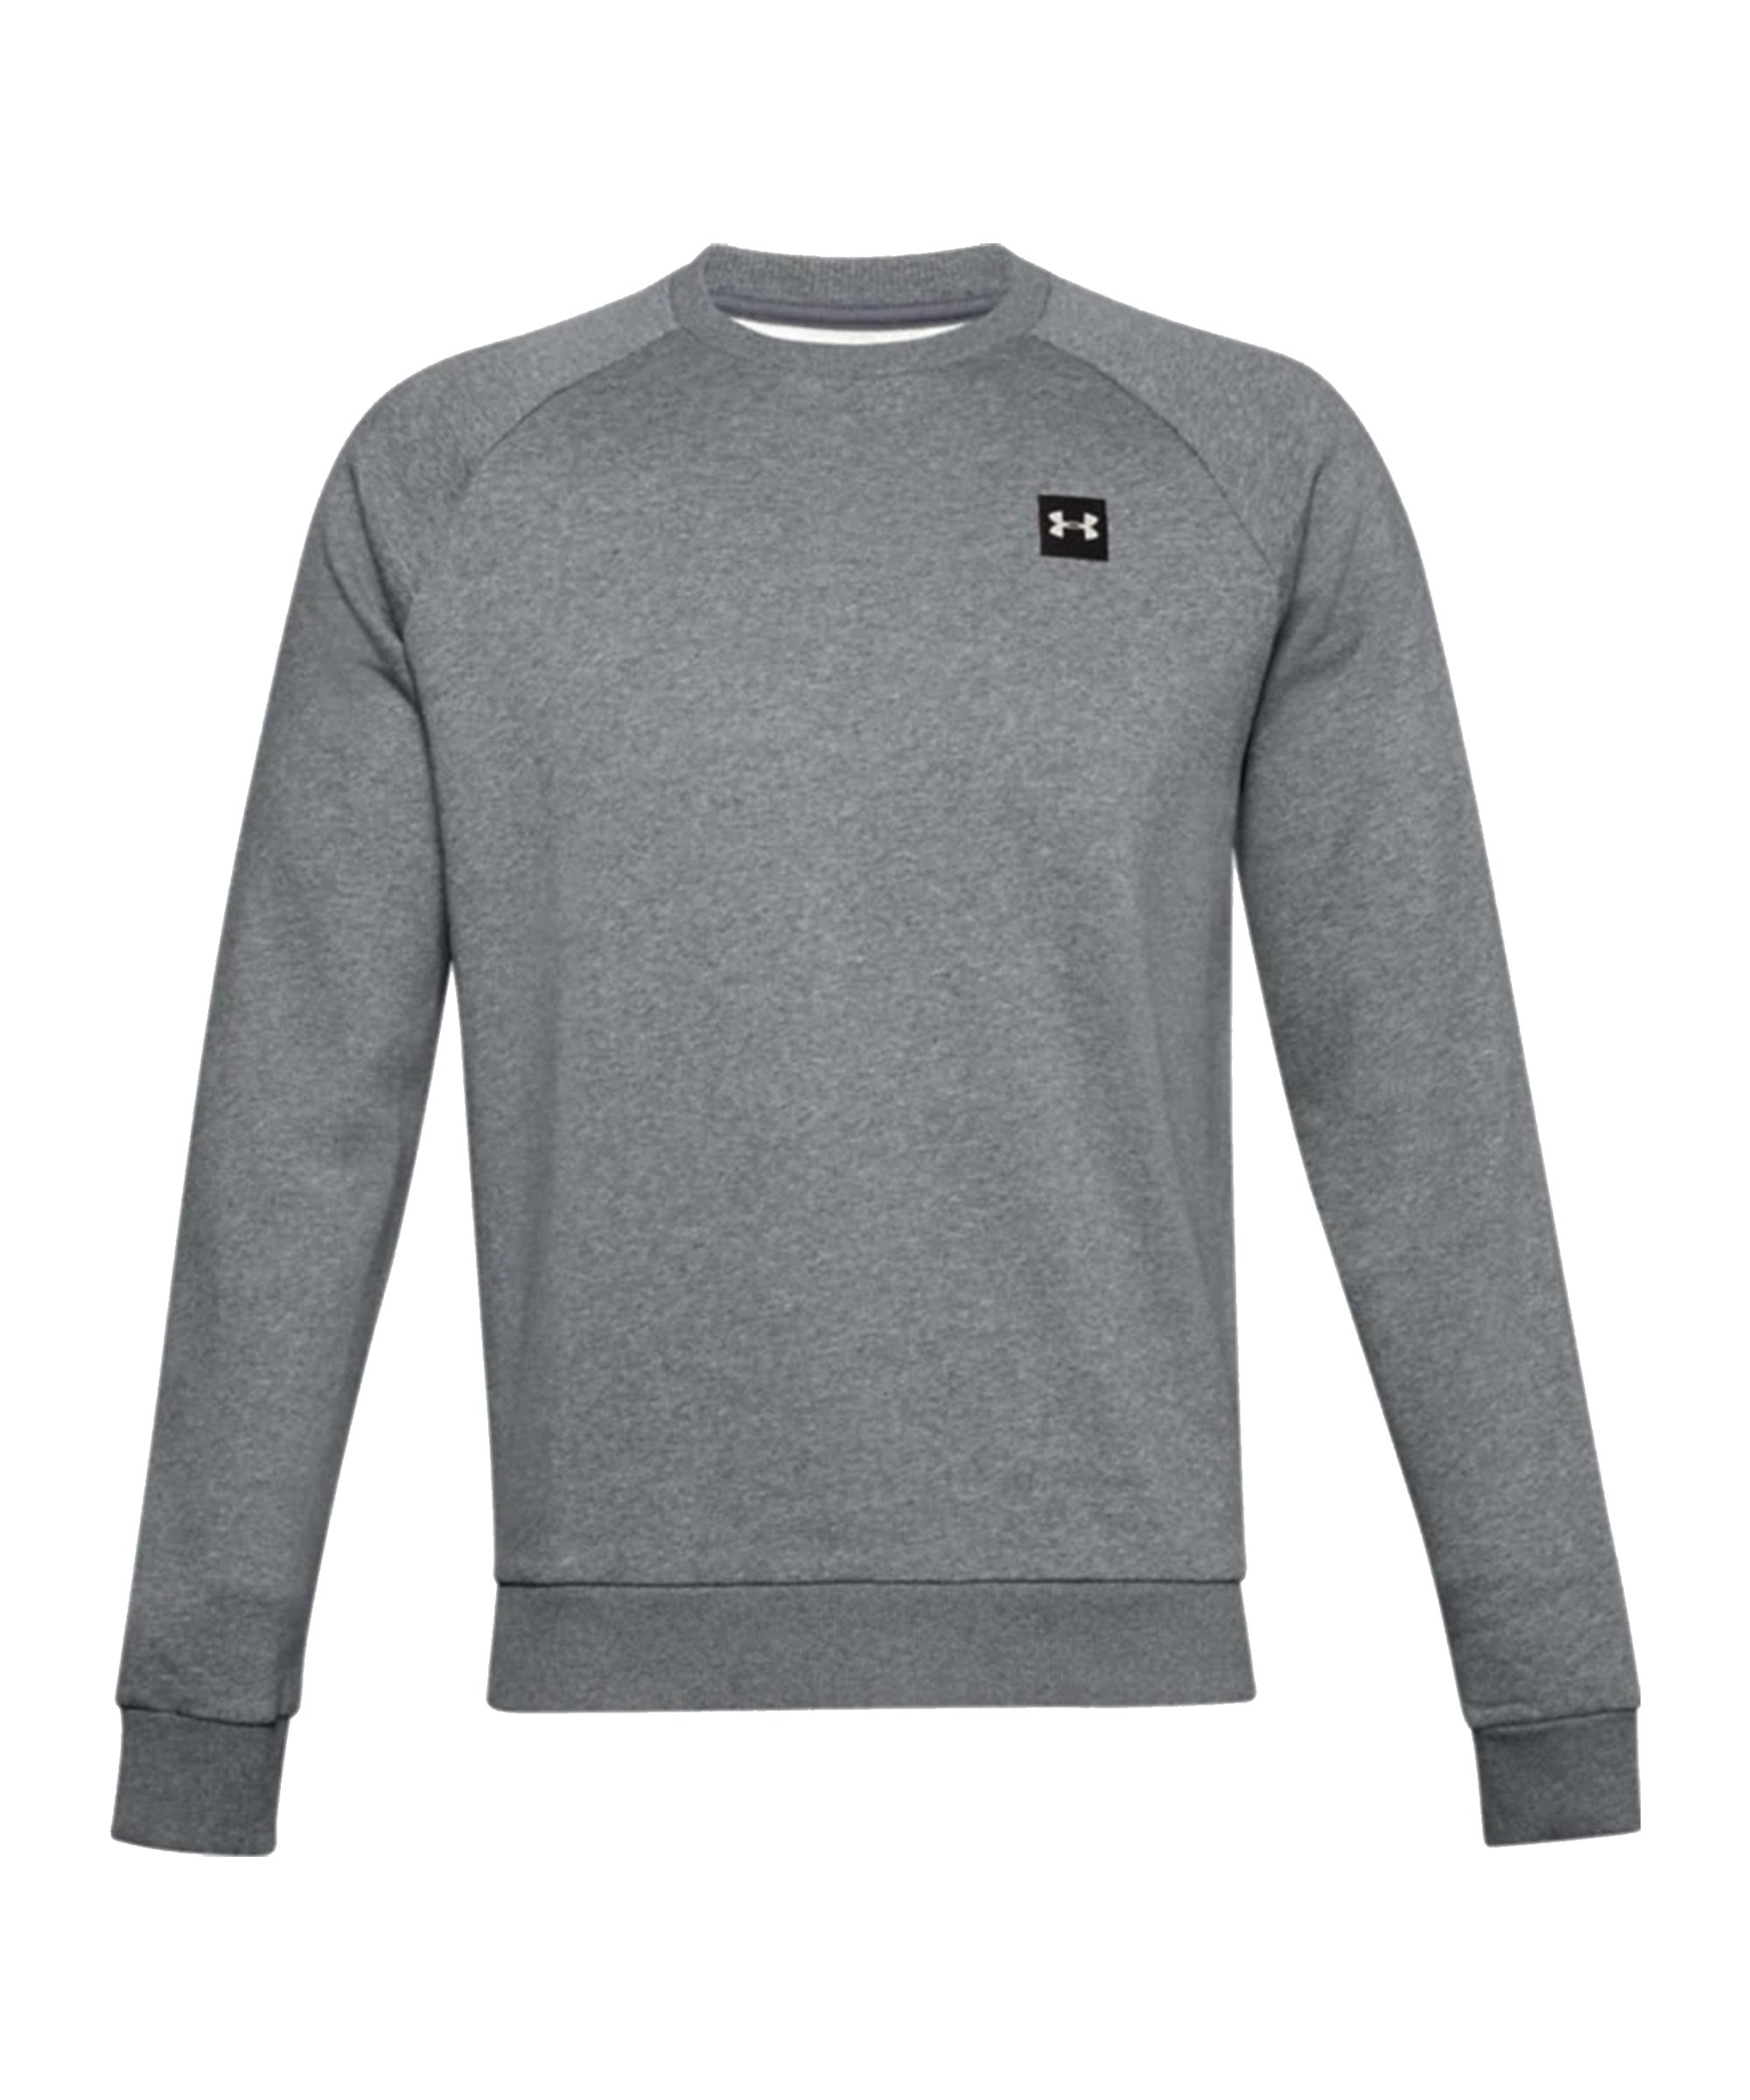 Under Armour Rival Fleece Crew Sweatshirt F012 - grau